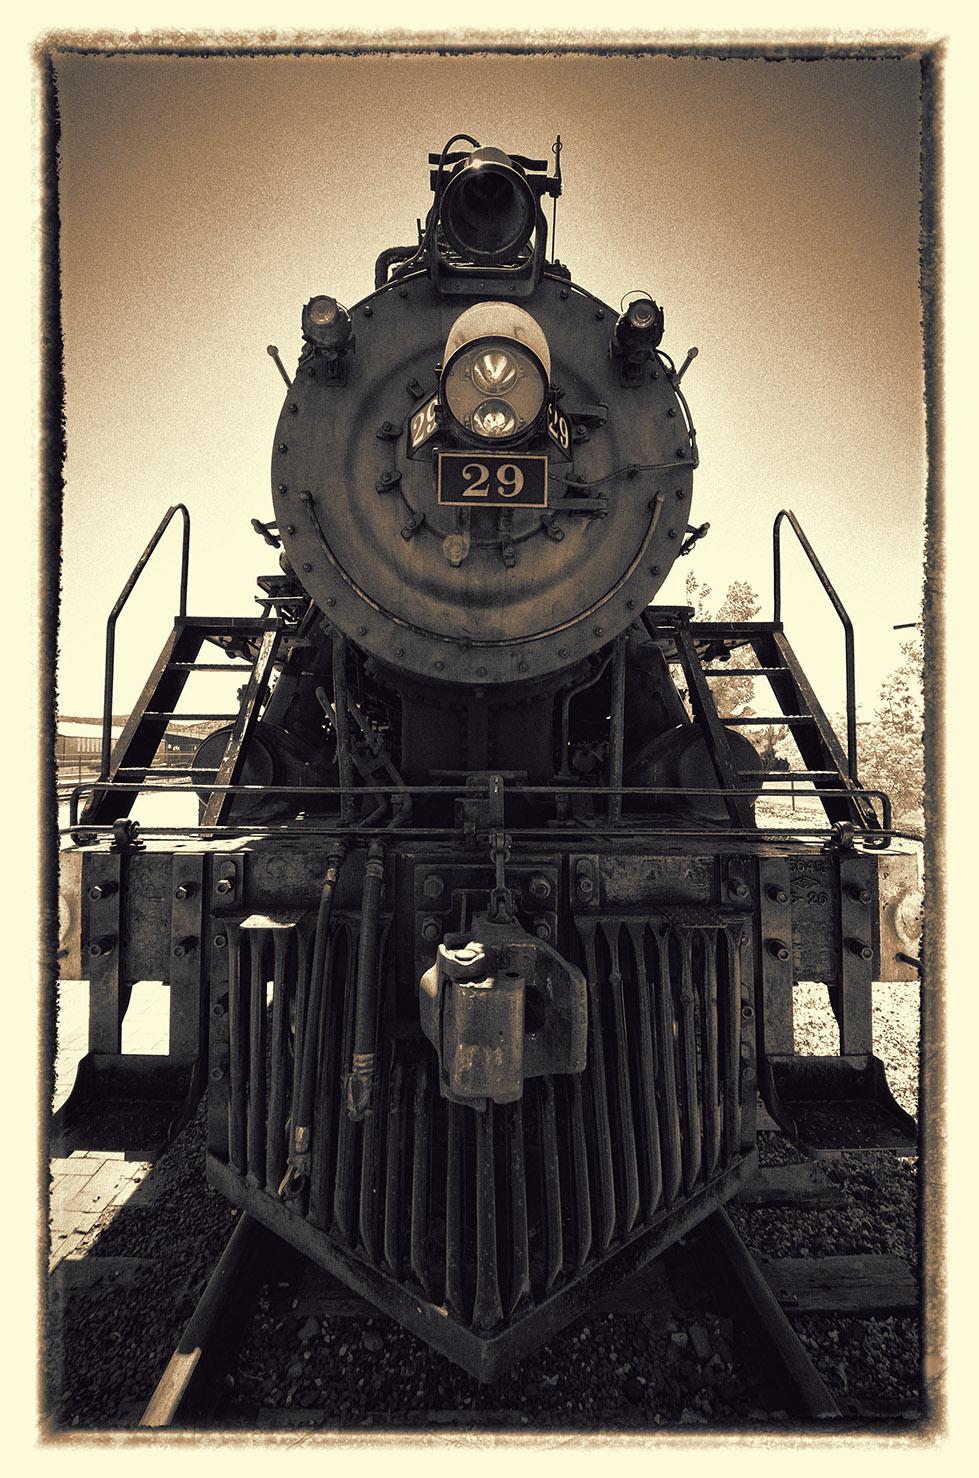 Engine #29